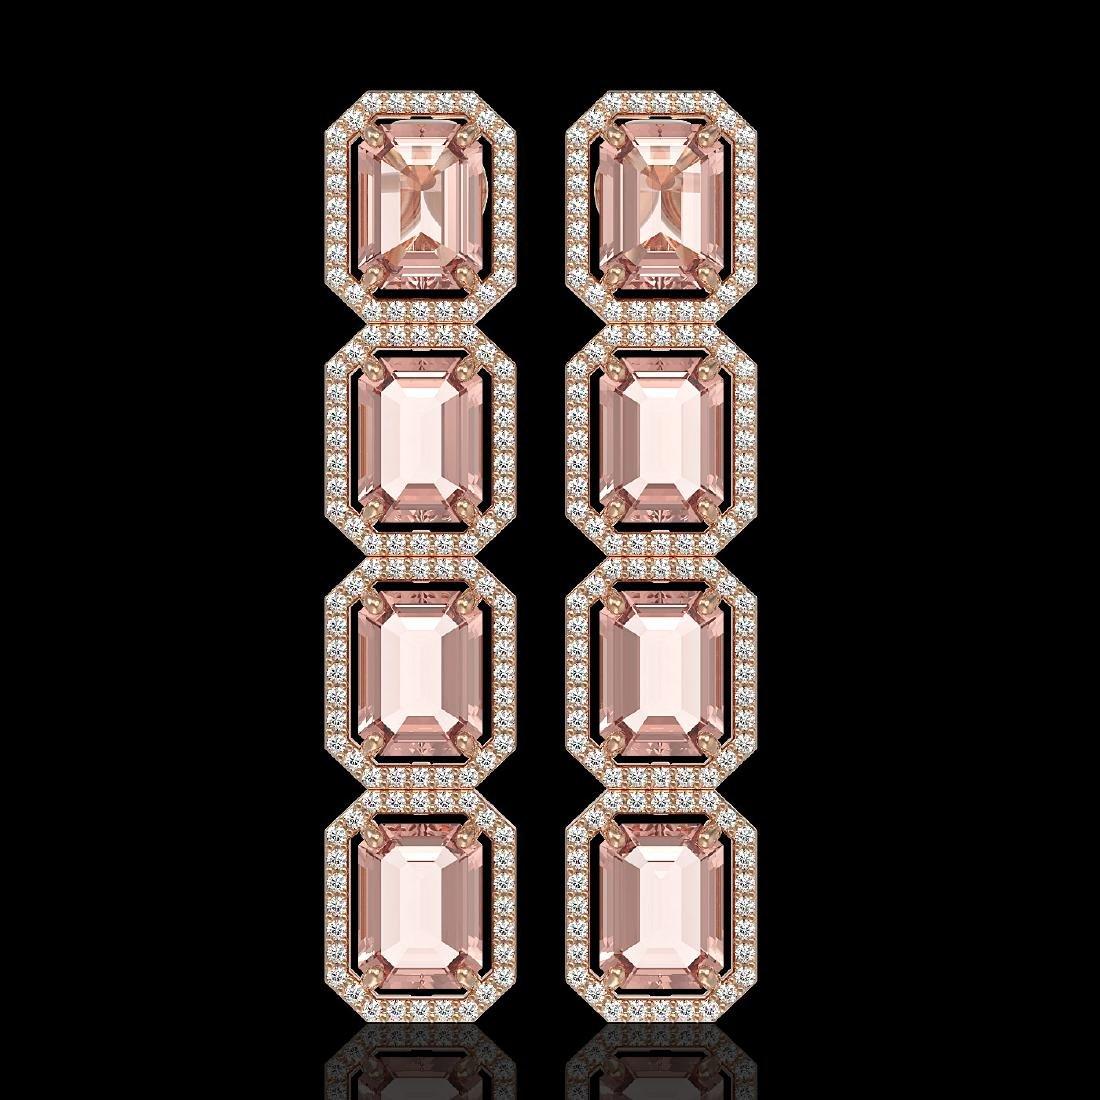 19.81 CTW Morganite & Diamond Halo Earrings 10K Rose